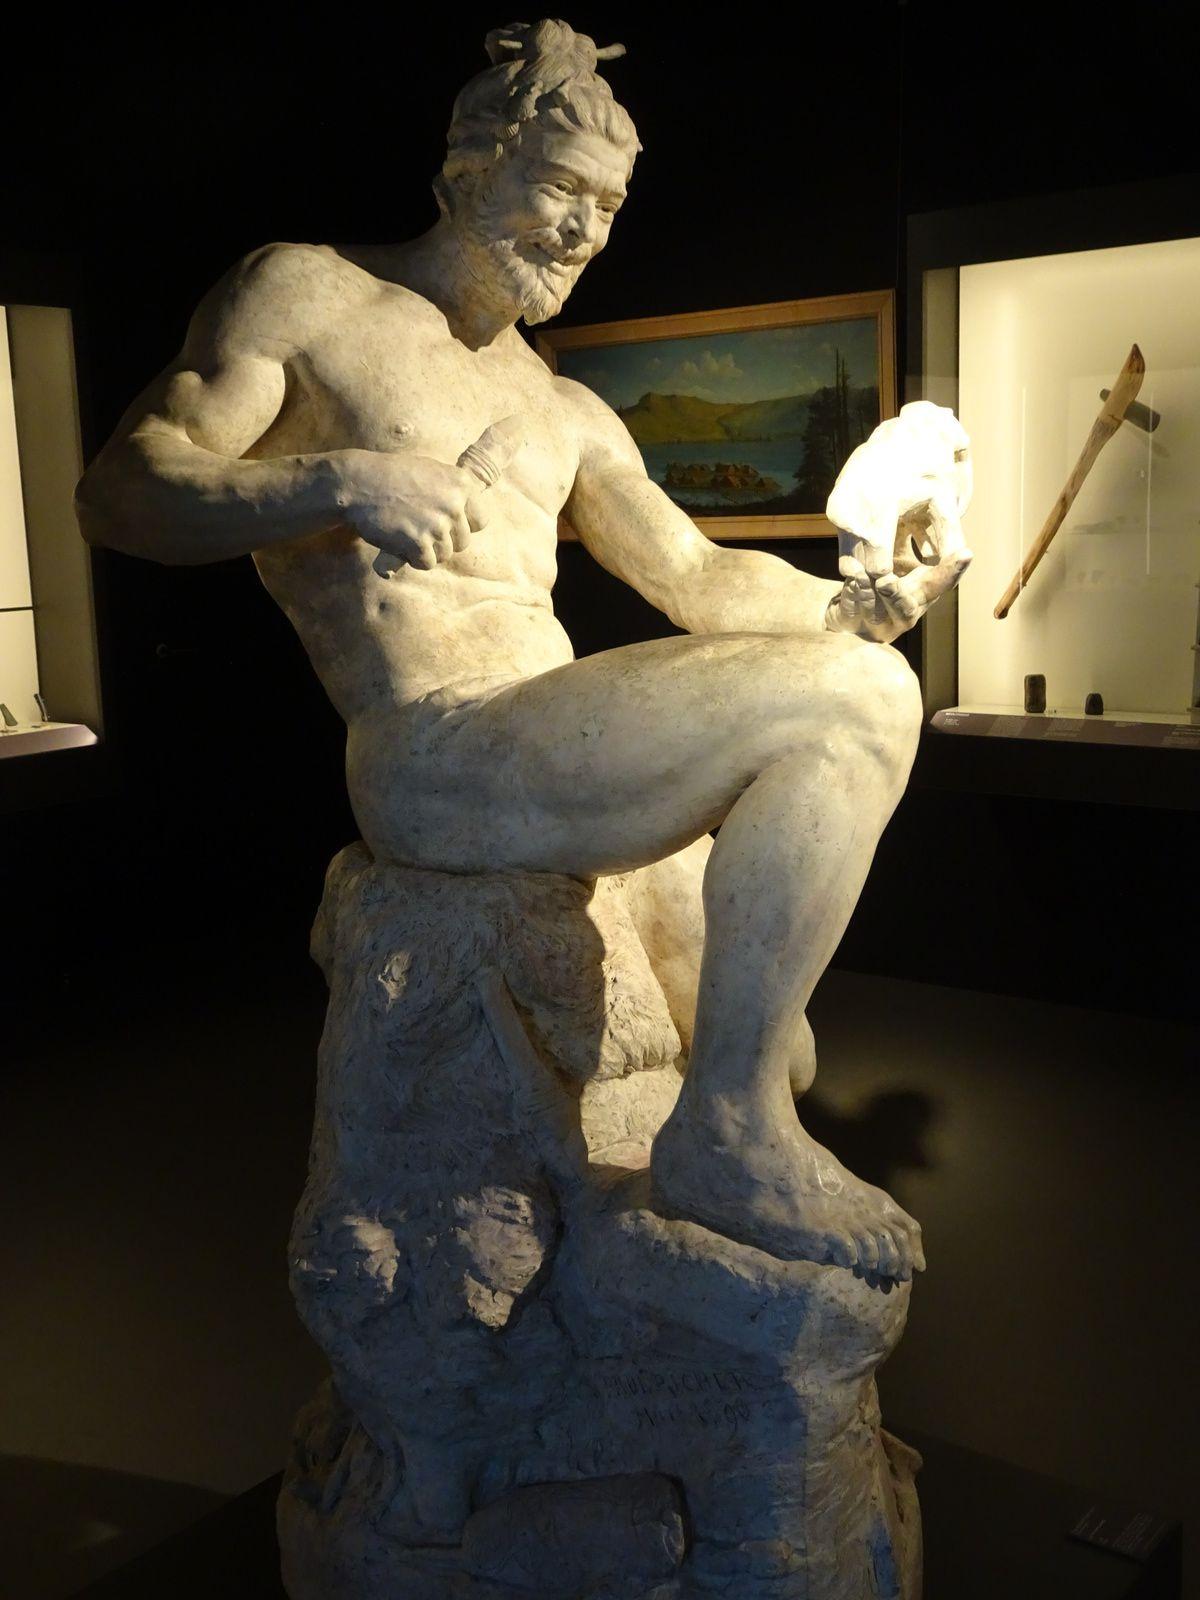 Musée Crozatier au Puy-en-Velay